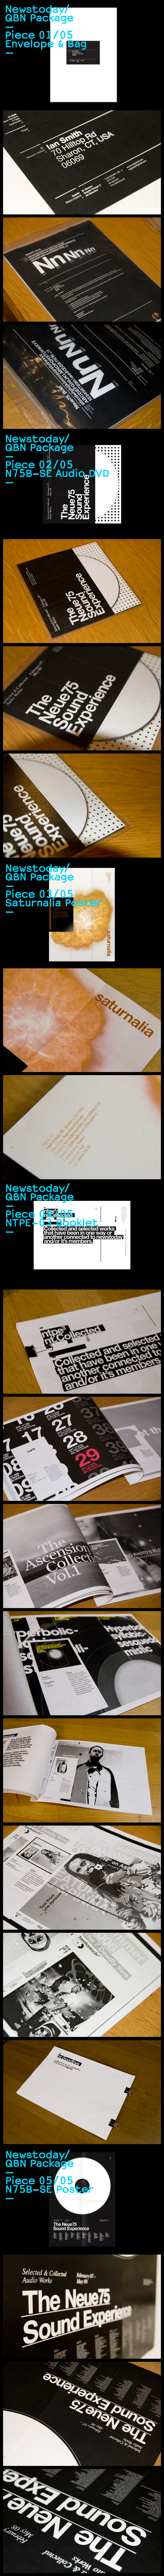 Print Design.